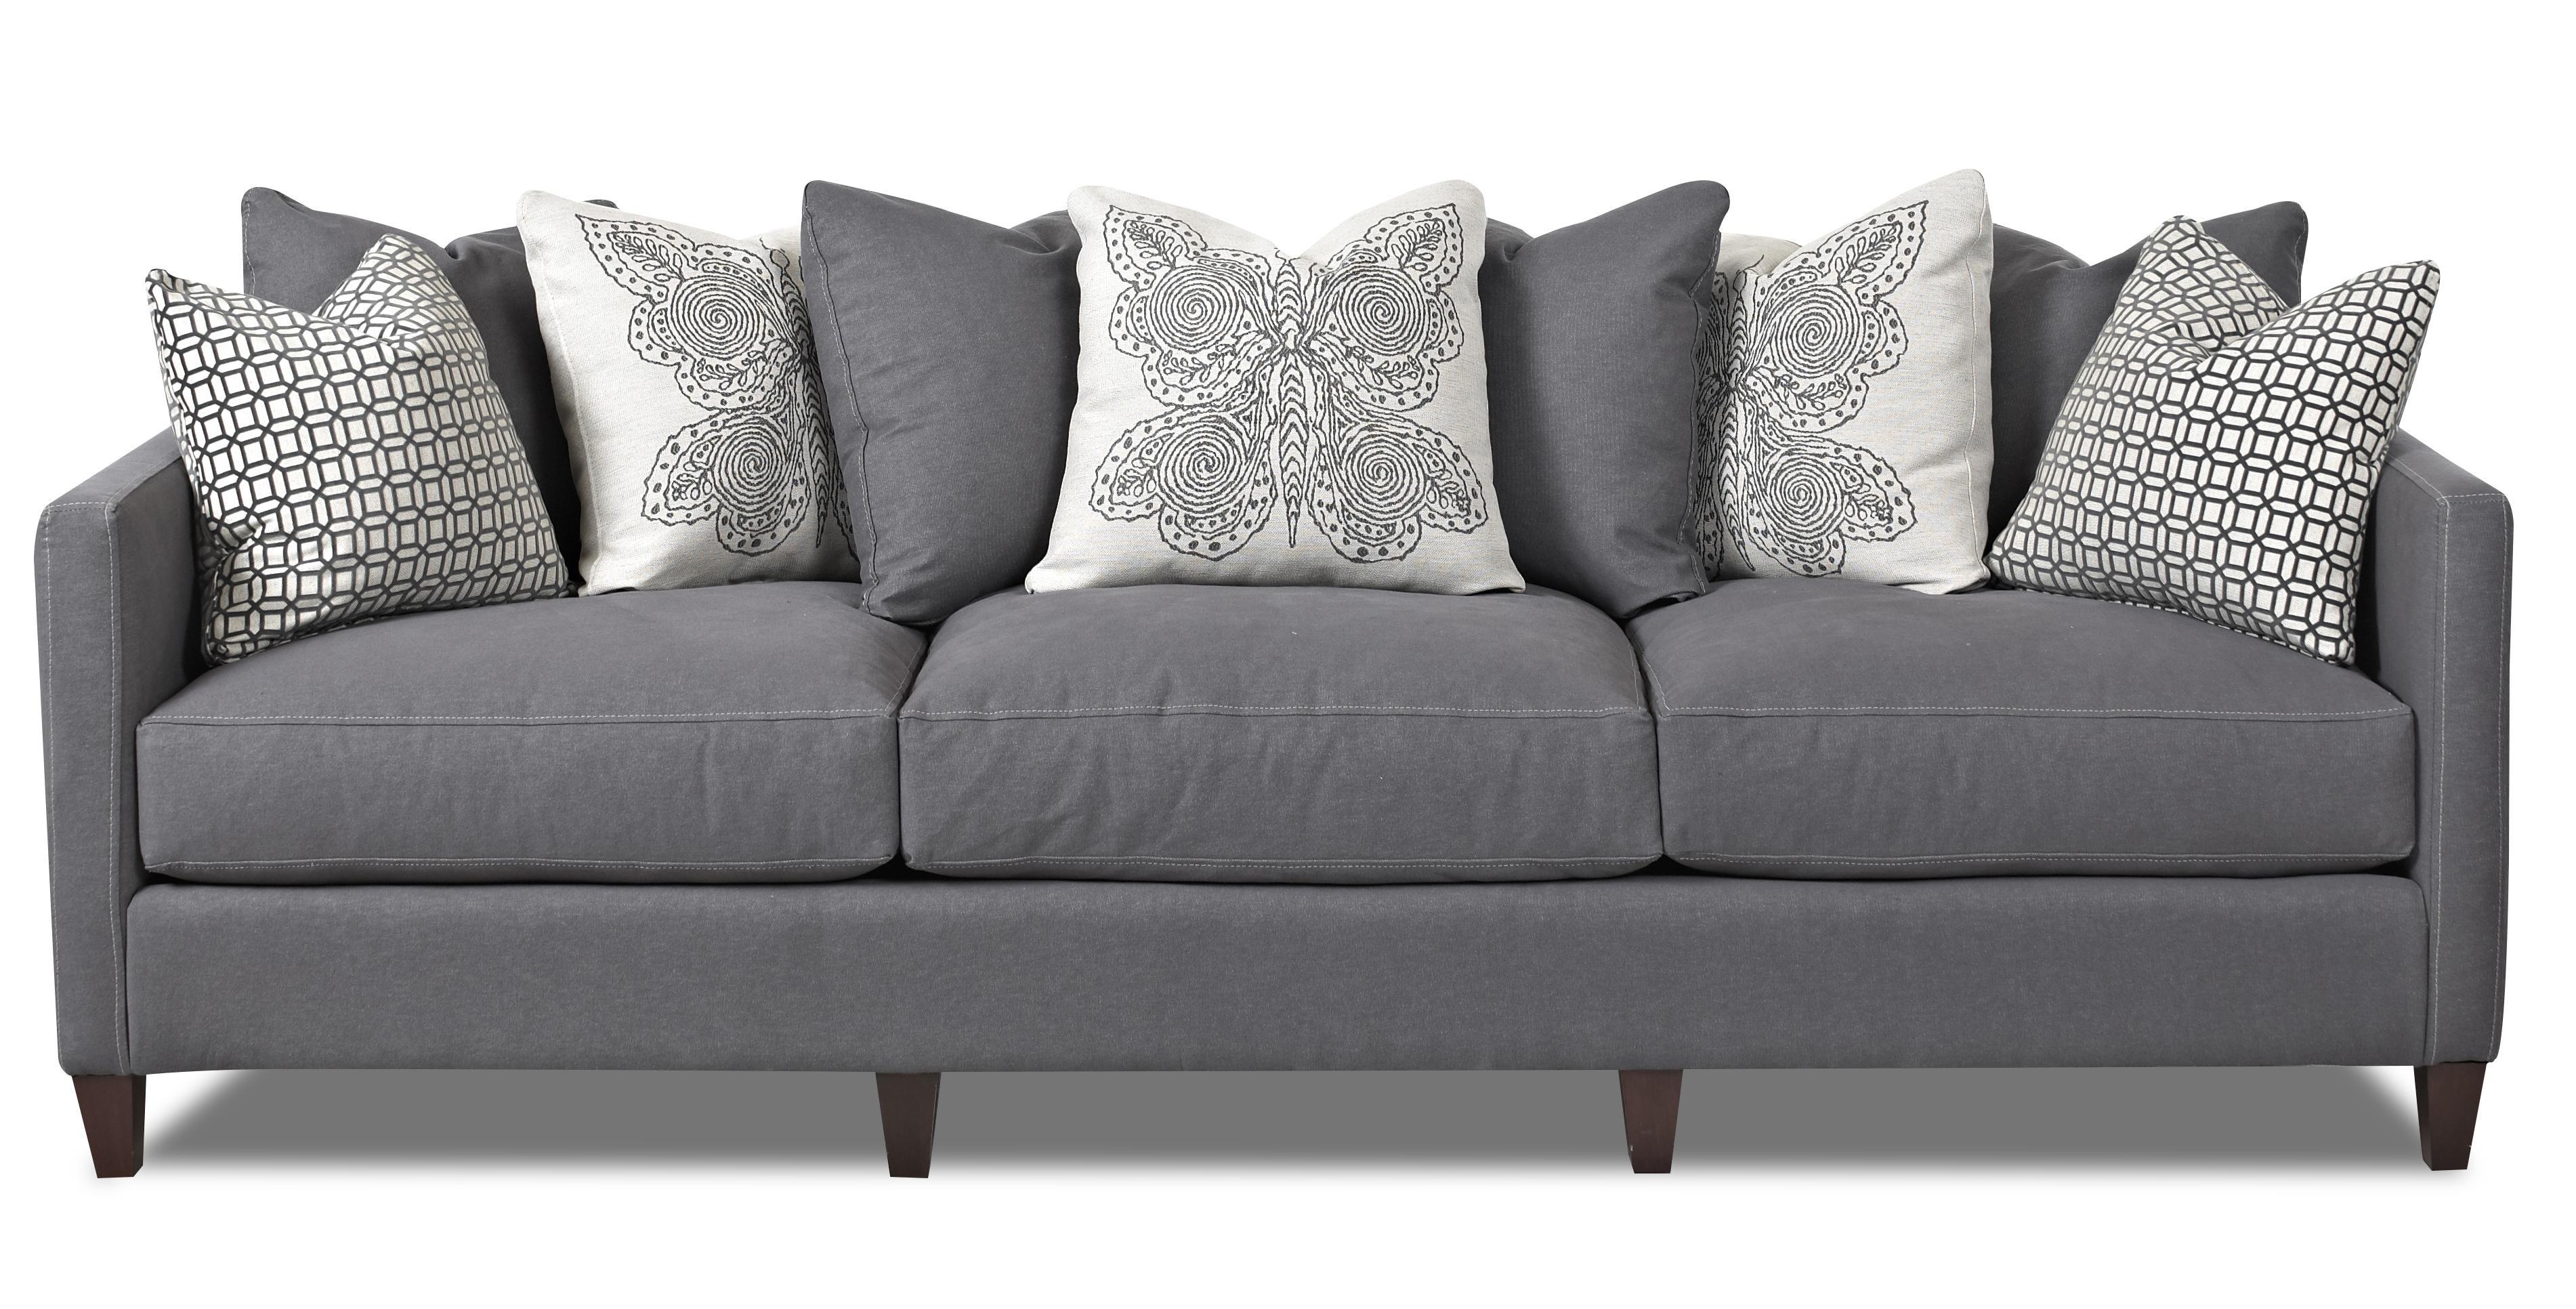 Klaussner Jordan Large 3 Cushion Tuxedo Arm Sofa with